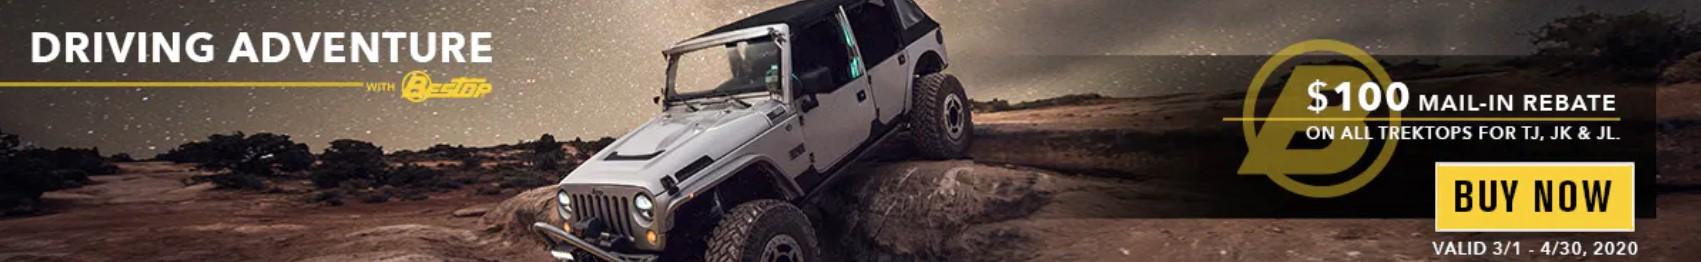 "Bestop: Get $100 Back on Trektop for TJ, JK, and JL During ""Driving Adventure"" Event"